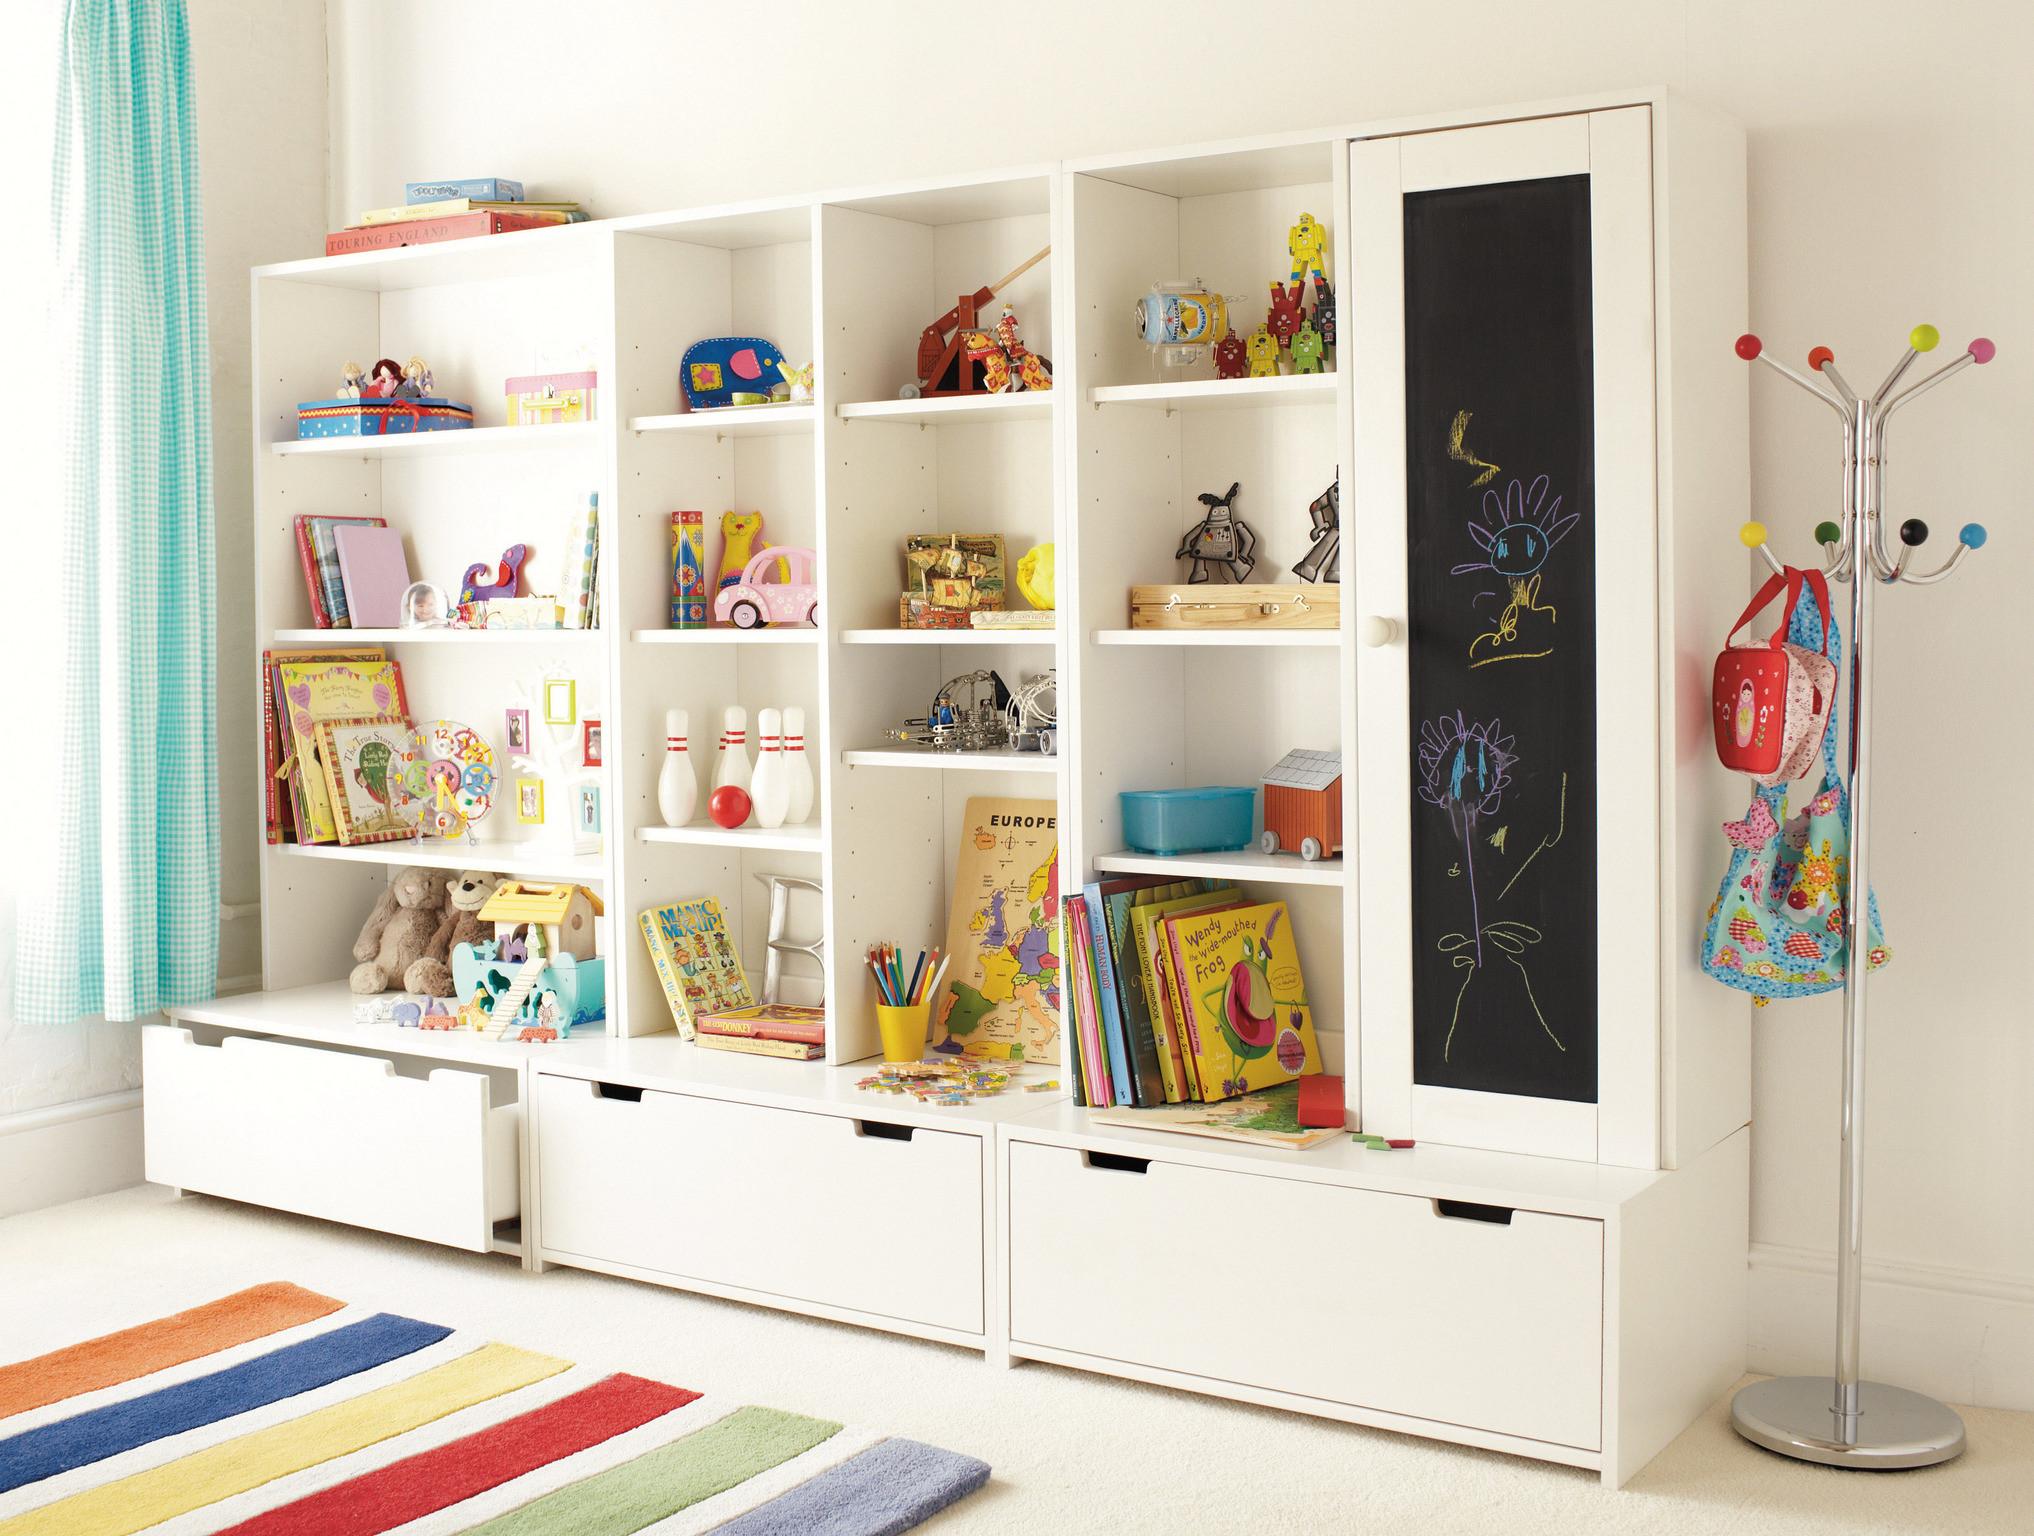 Kids Bedroom Storage  Most Precise Children's Playroom Storage Ideas 42 Room